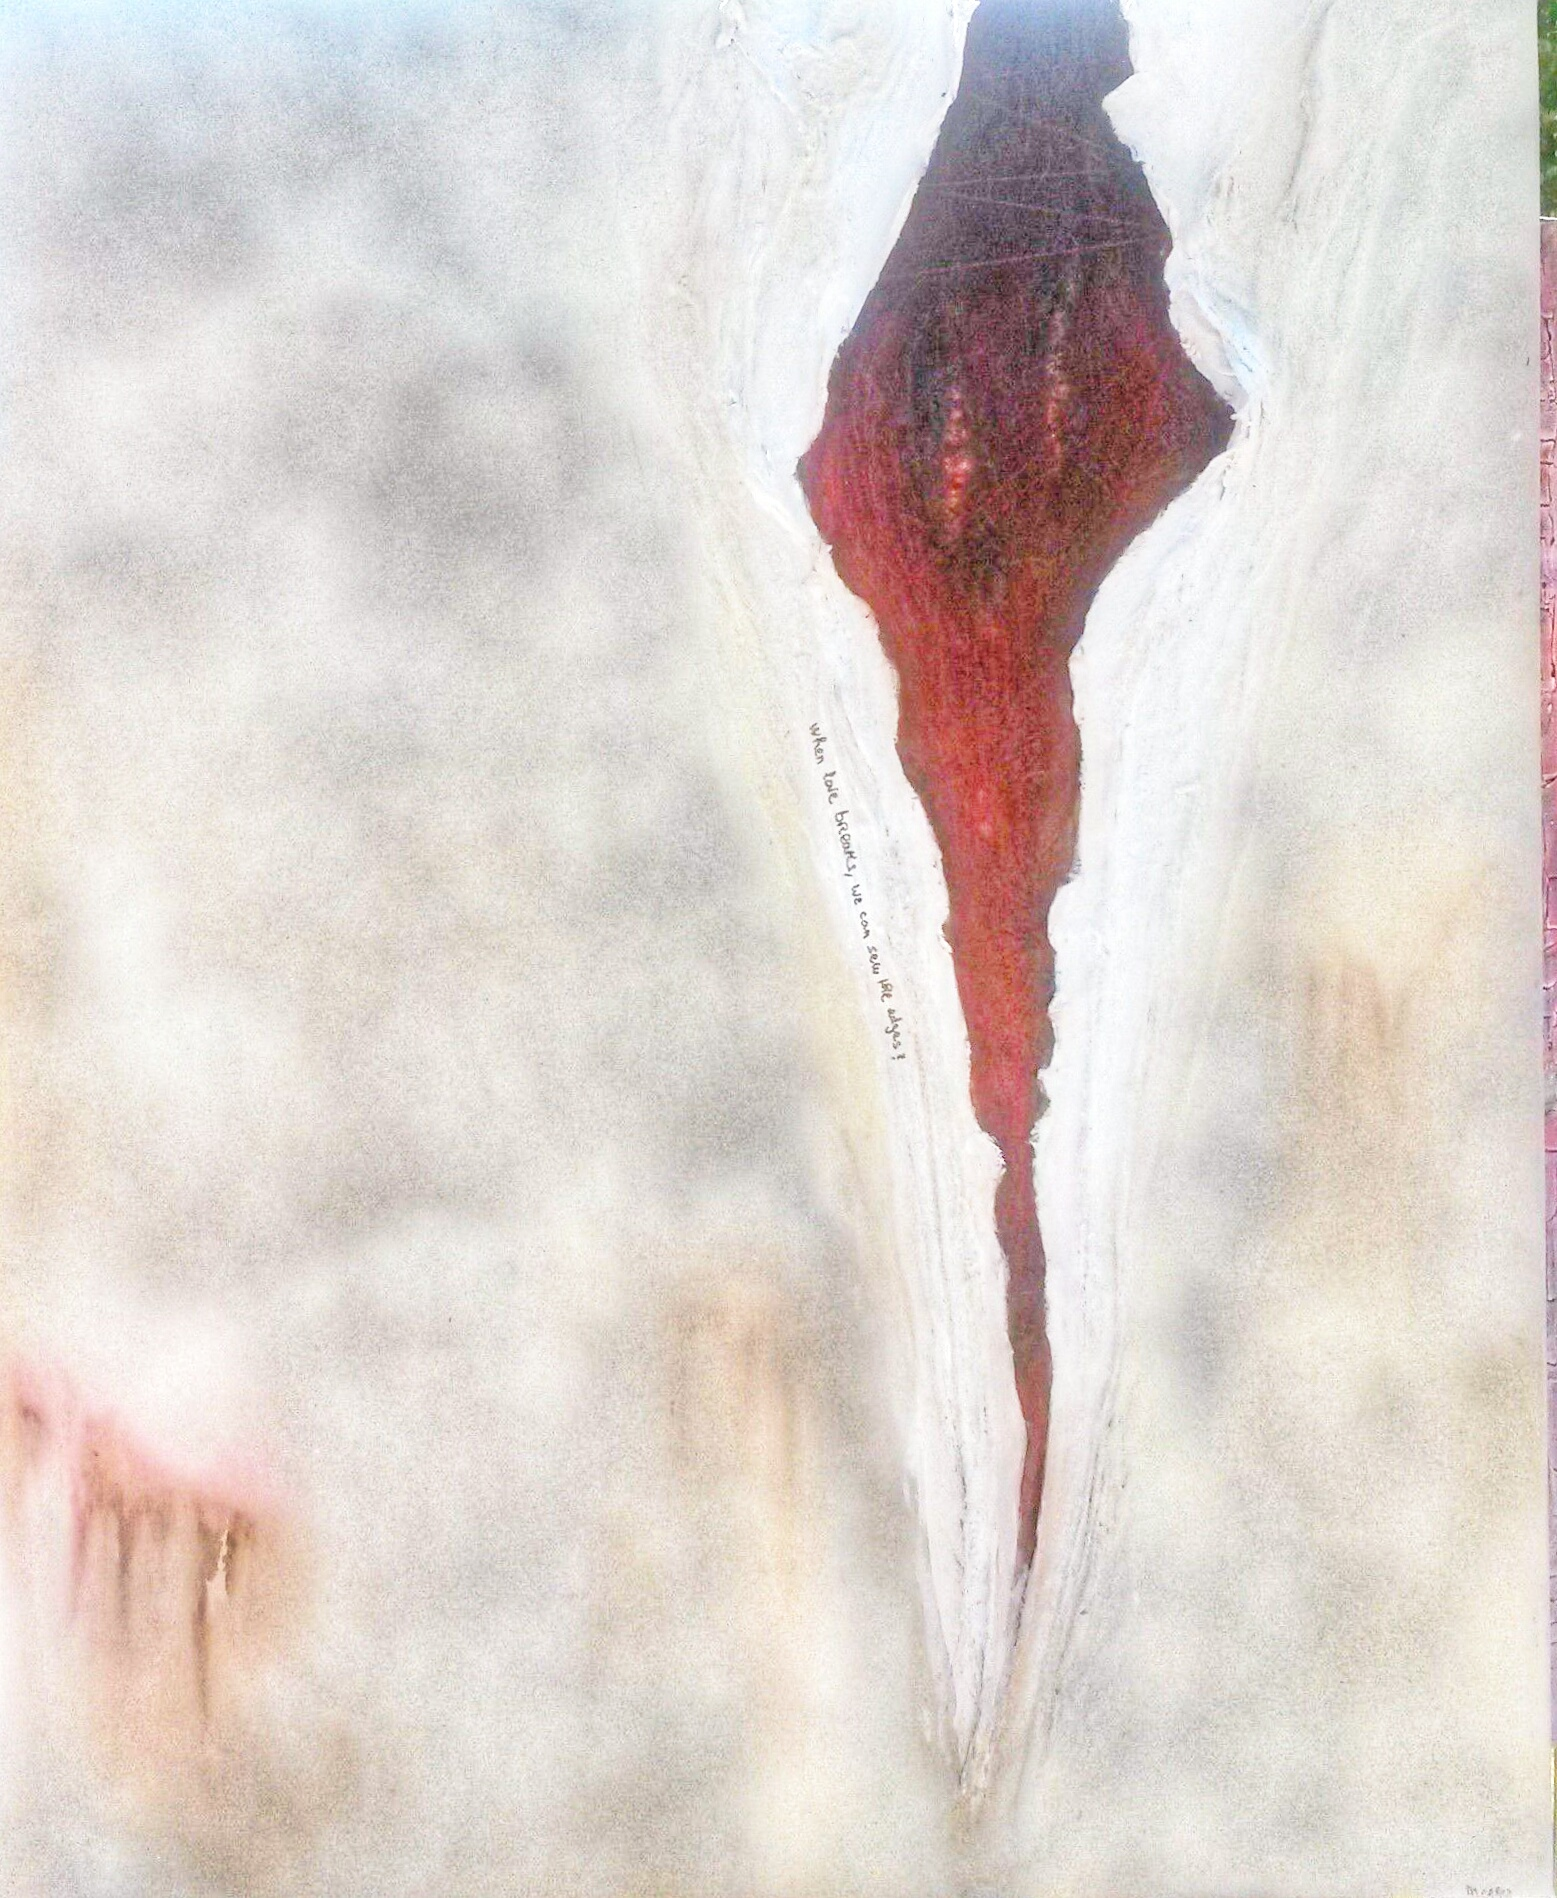 Peinture abstraite sur cicatrice Mireille Cerea artiste peintre